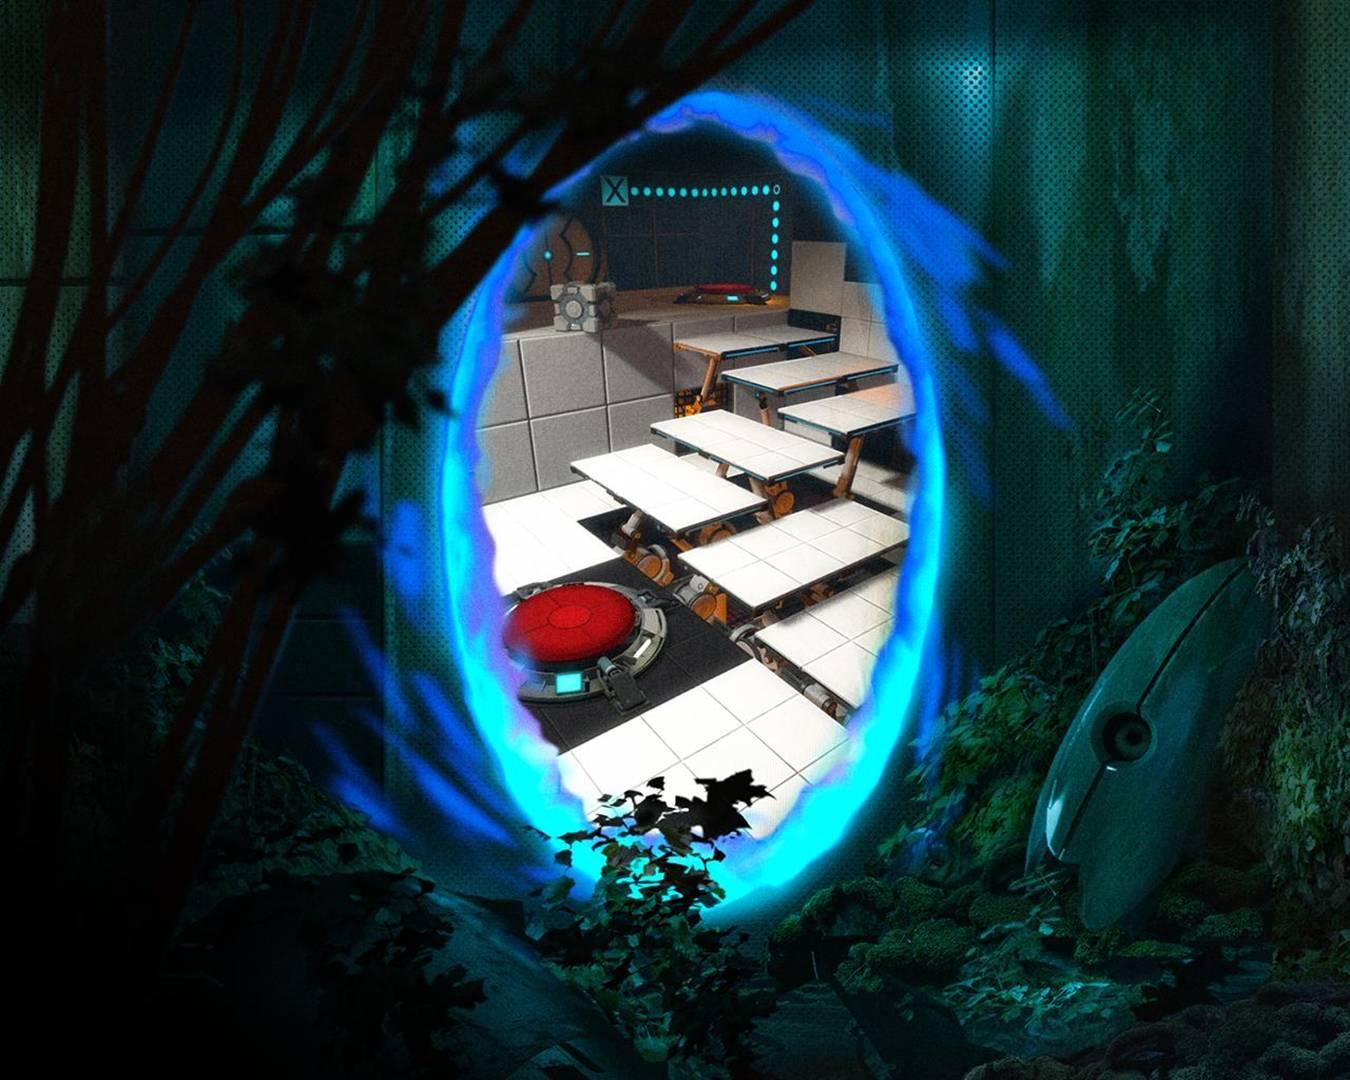 Portal 2 Wallpapers in full 1080P HD